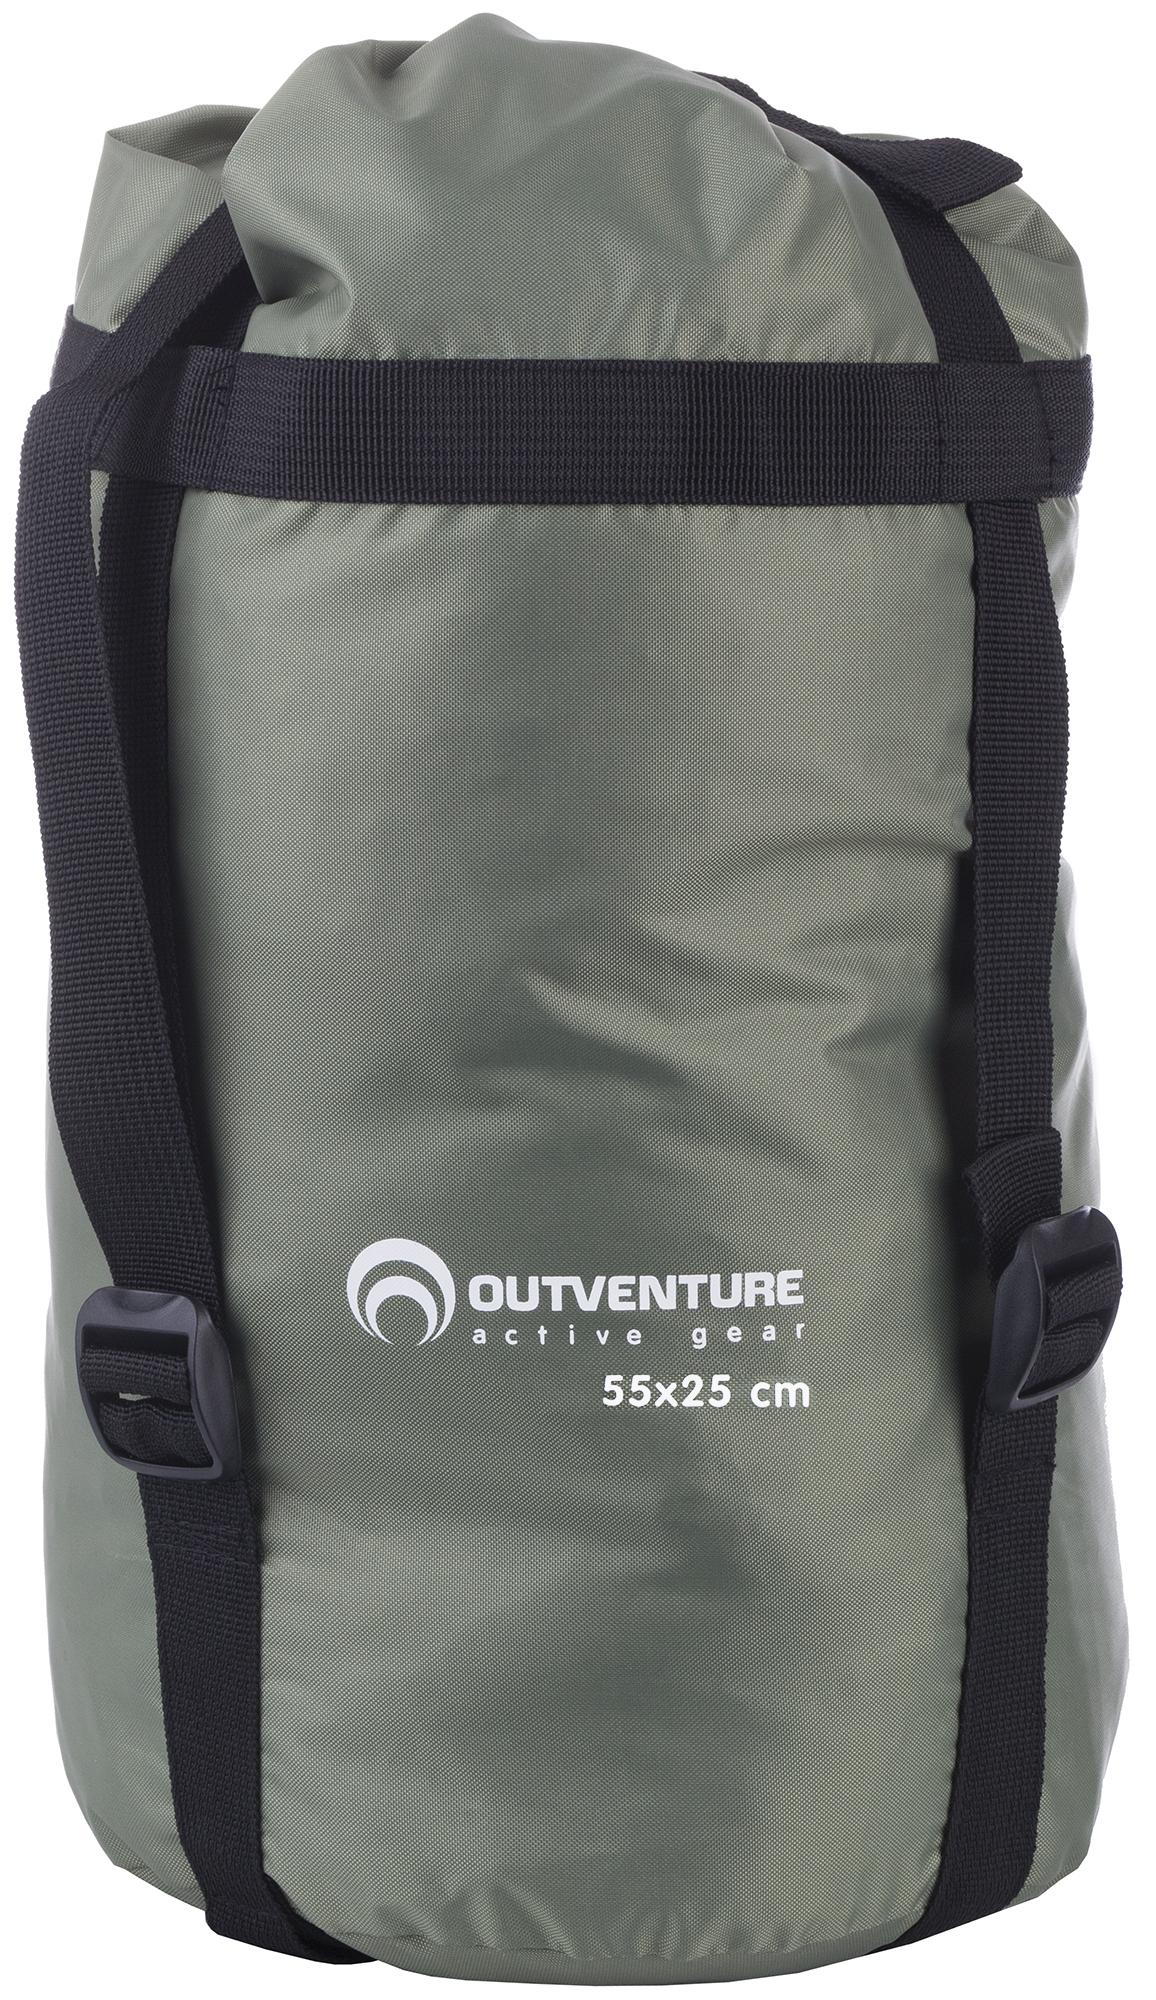 Outventure Компрессионный мешок Outventure, 27 л belvedere коррекция объ ма